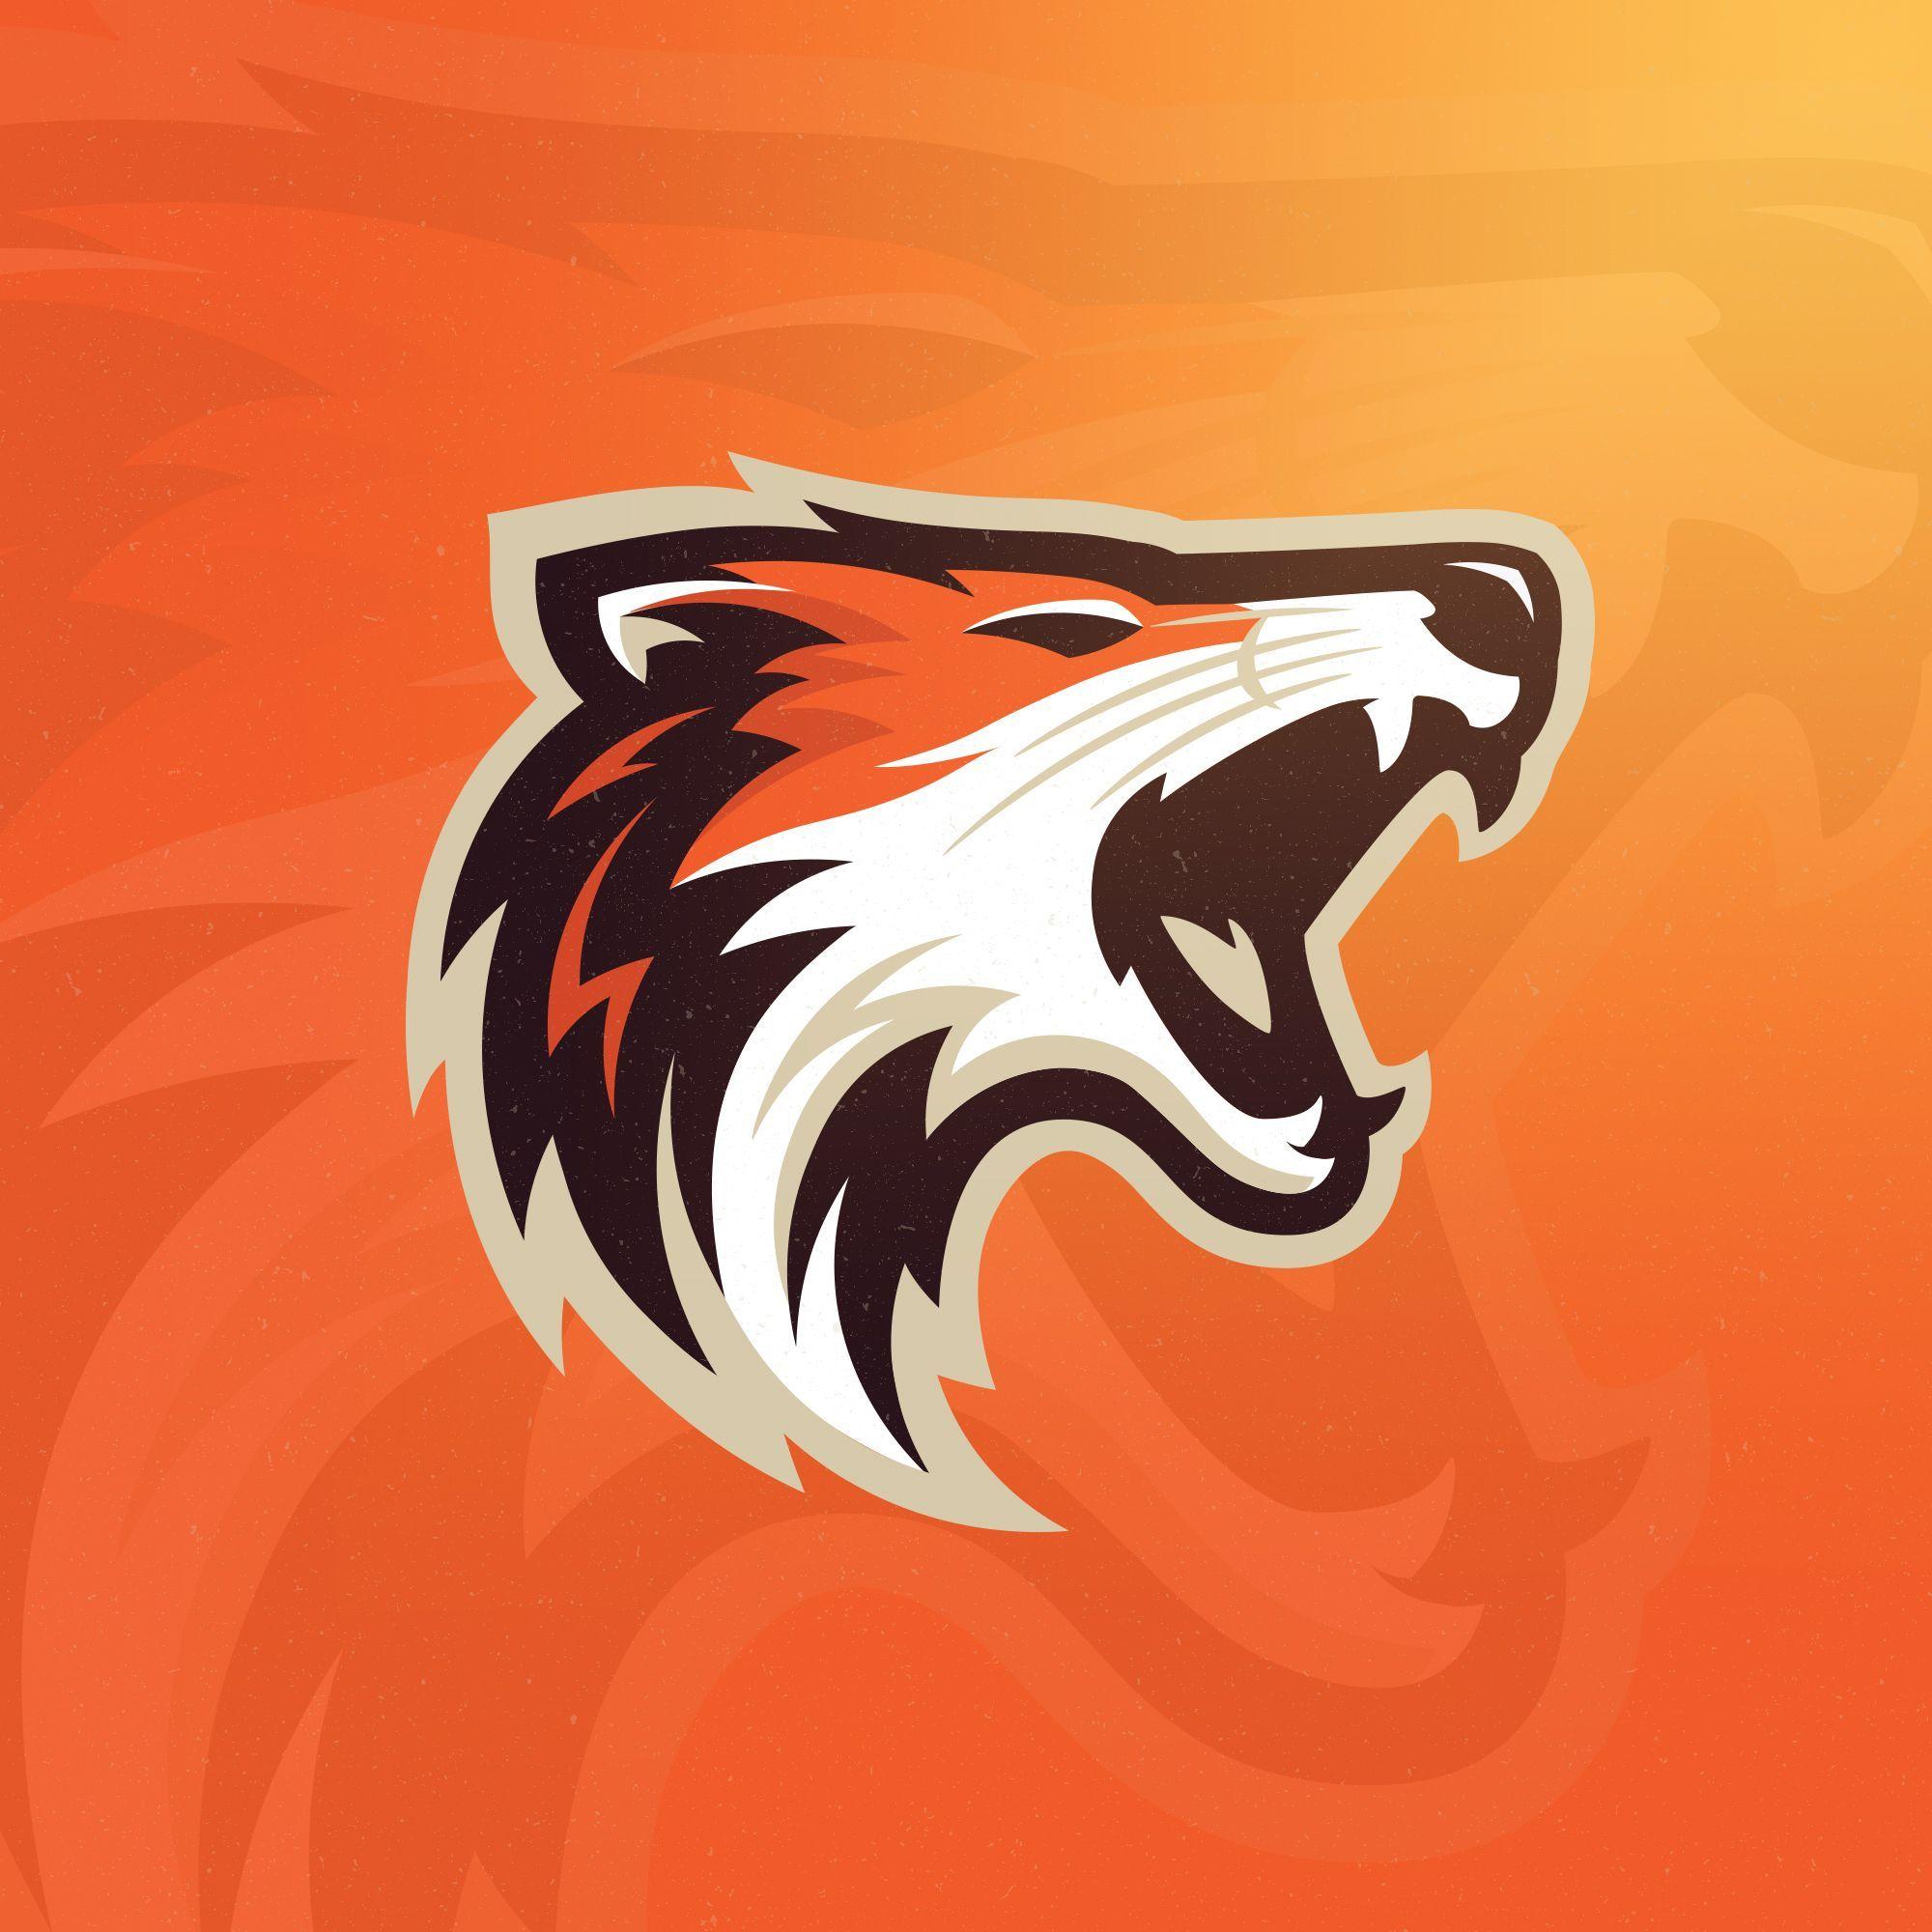 Hasil gambar untuk logo esport fox Logo keren, Desain